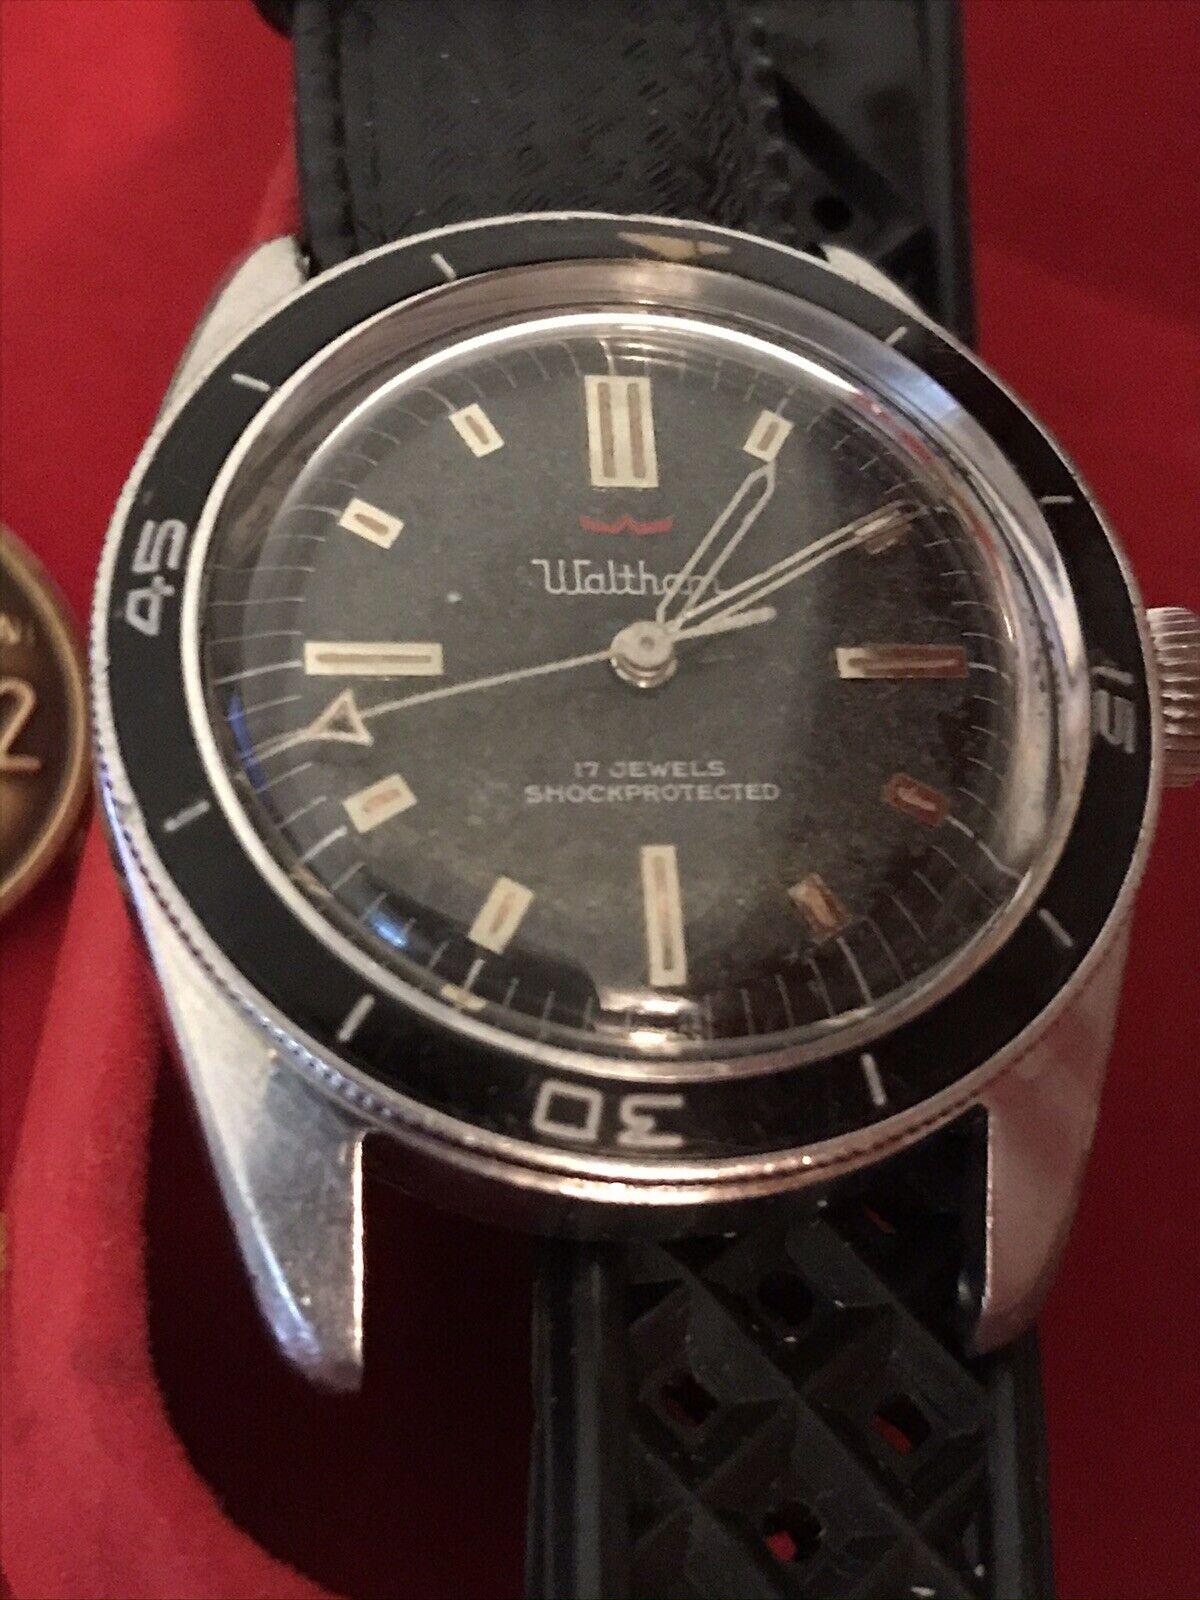 Vintage Waltham Blancpain Bathyscaphe Bakelite Skin Diver Paul Newman *No Resv* - watch picture 1